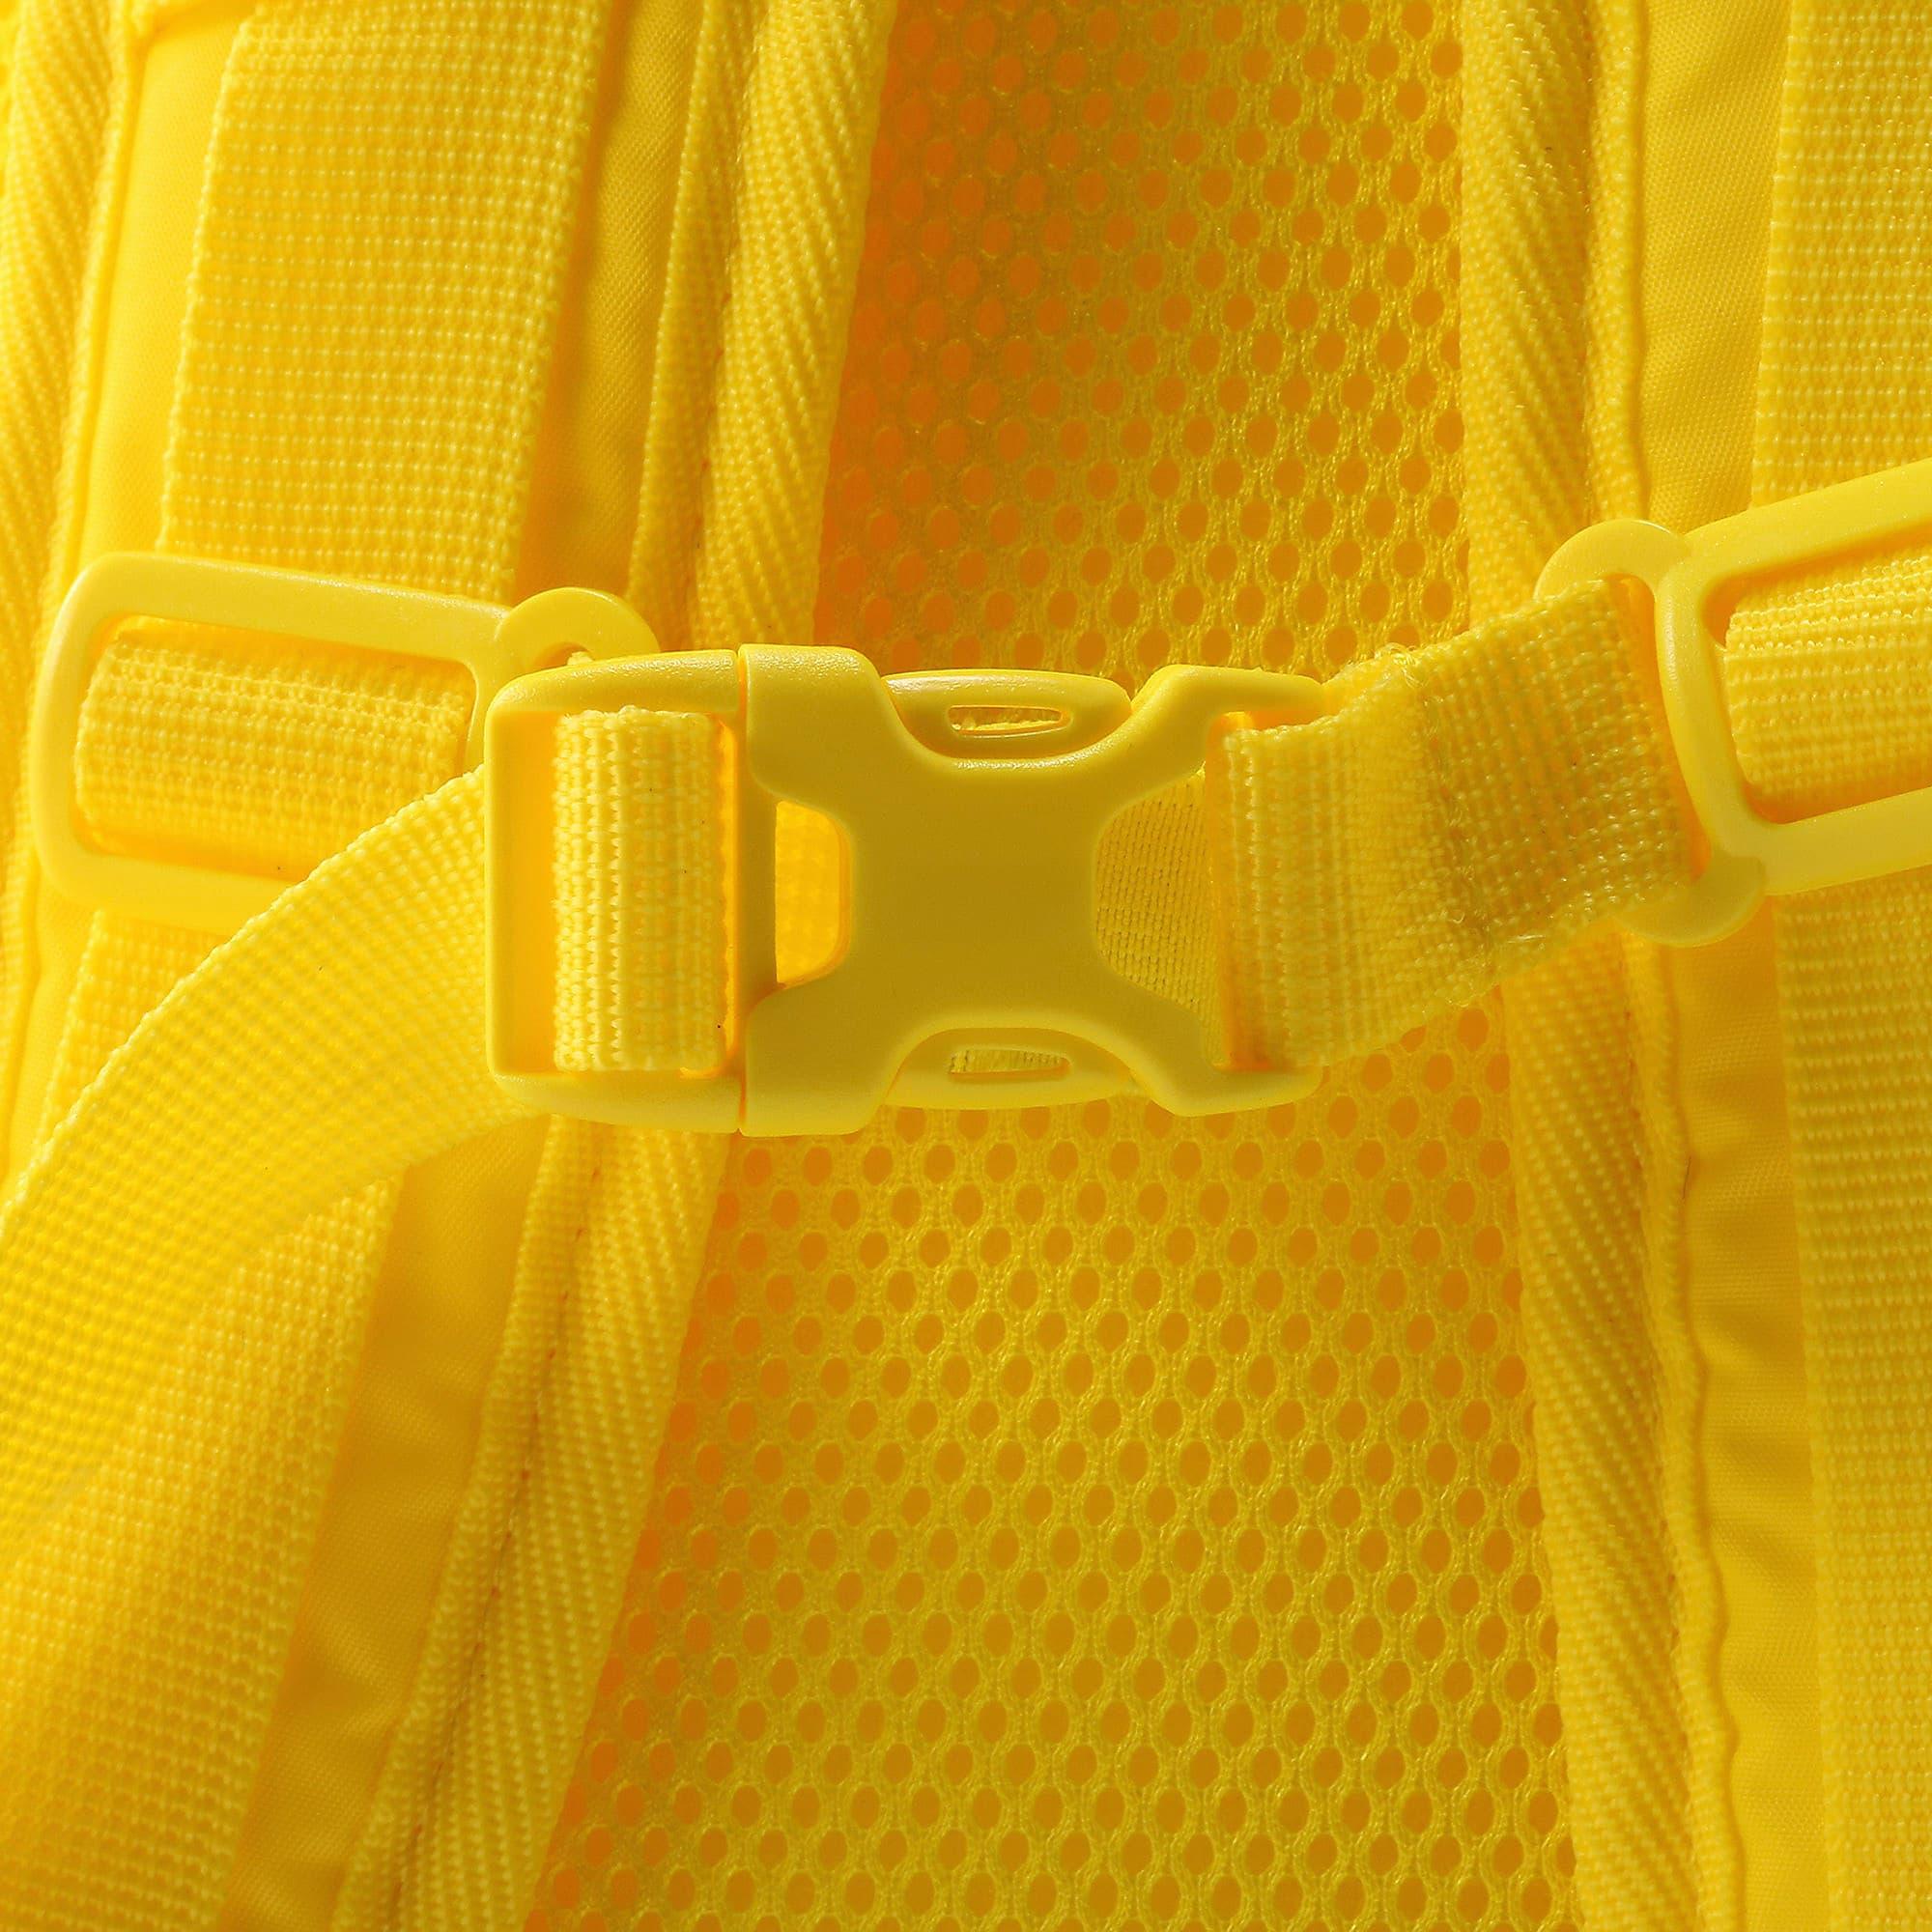 Thumbnail 8 of ウィメンズ コズミック バックパック 20L, Blazing Yellow, medium-JPN